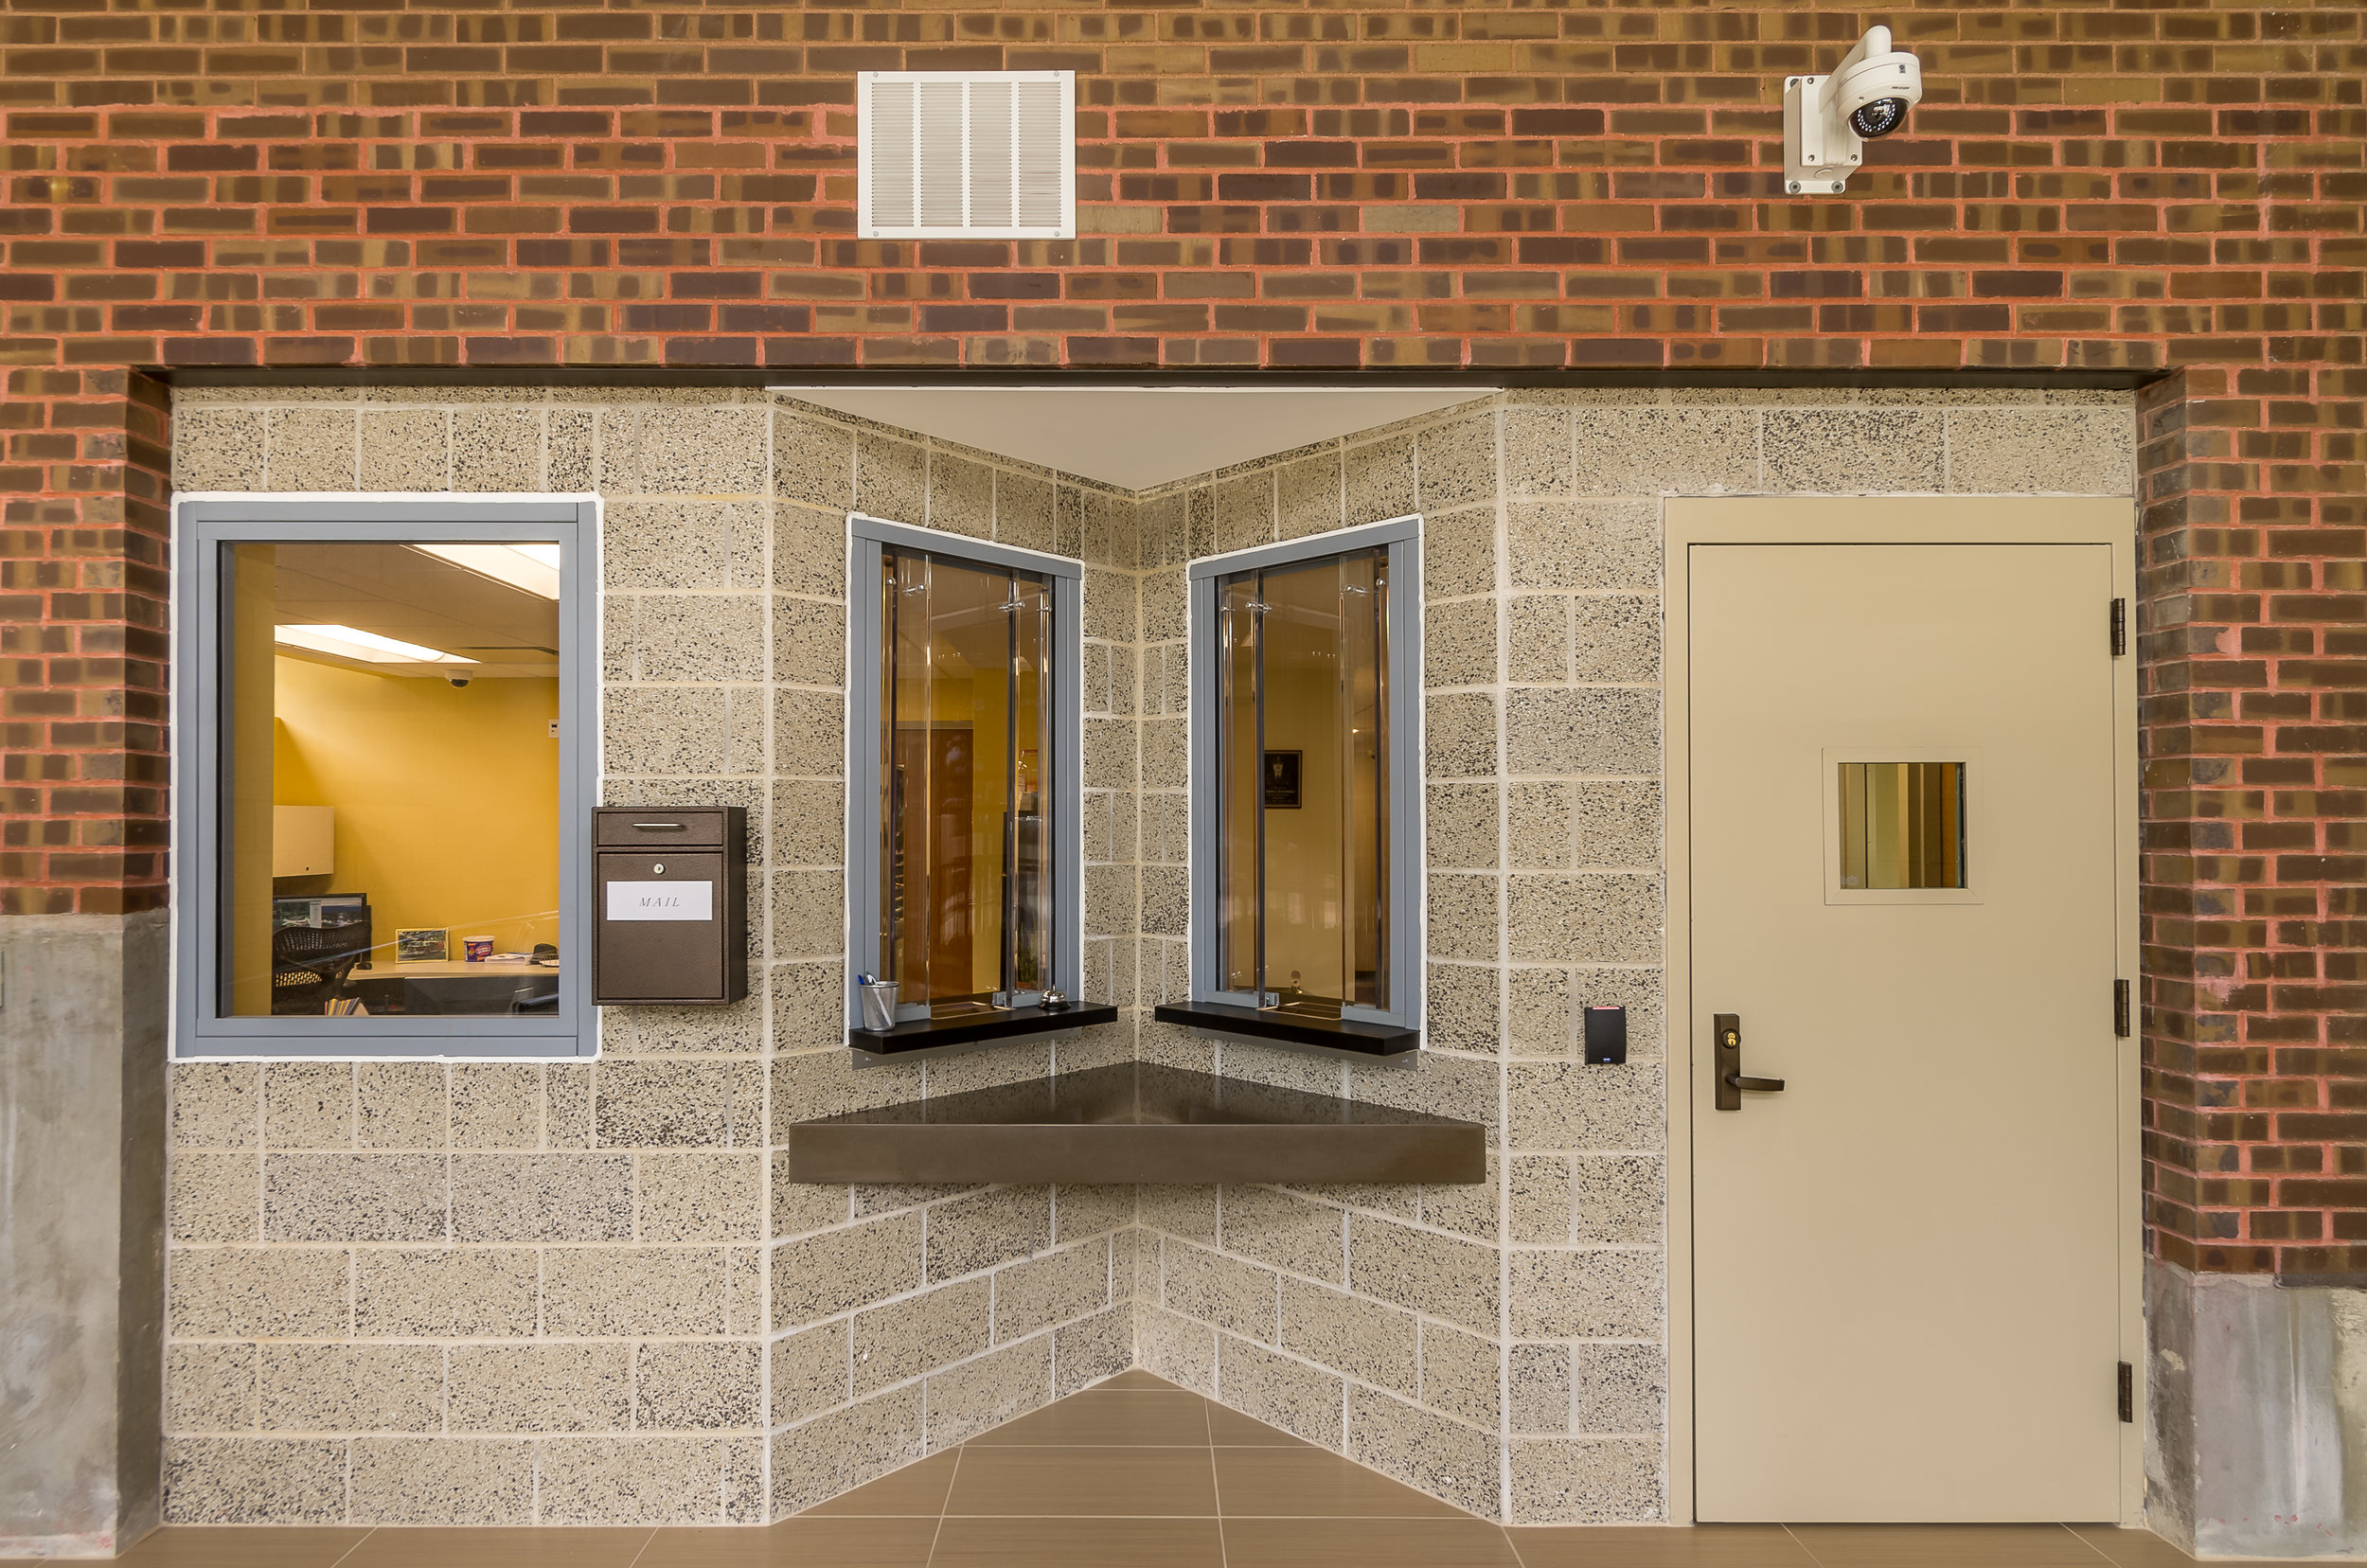 Streator City Hall-0111.jpg